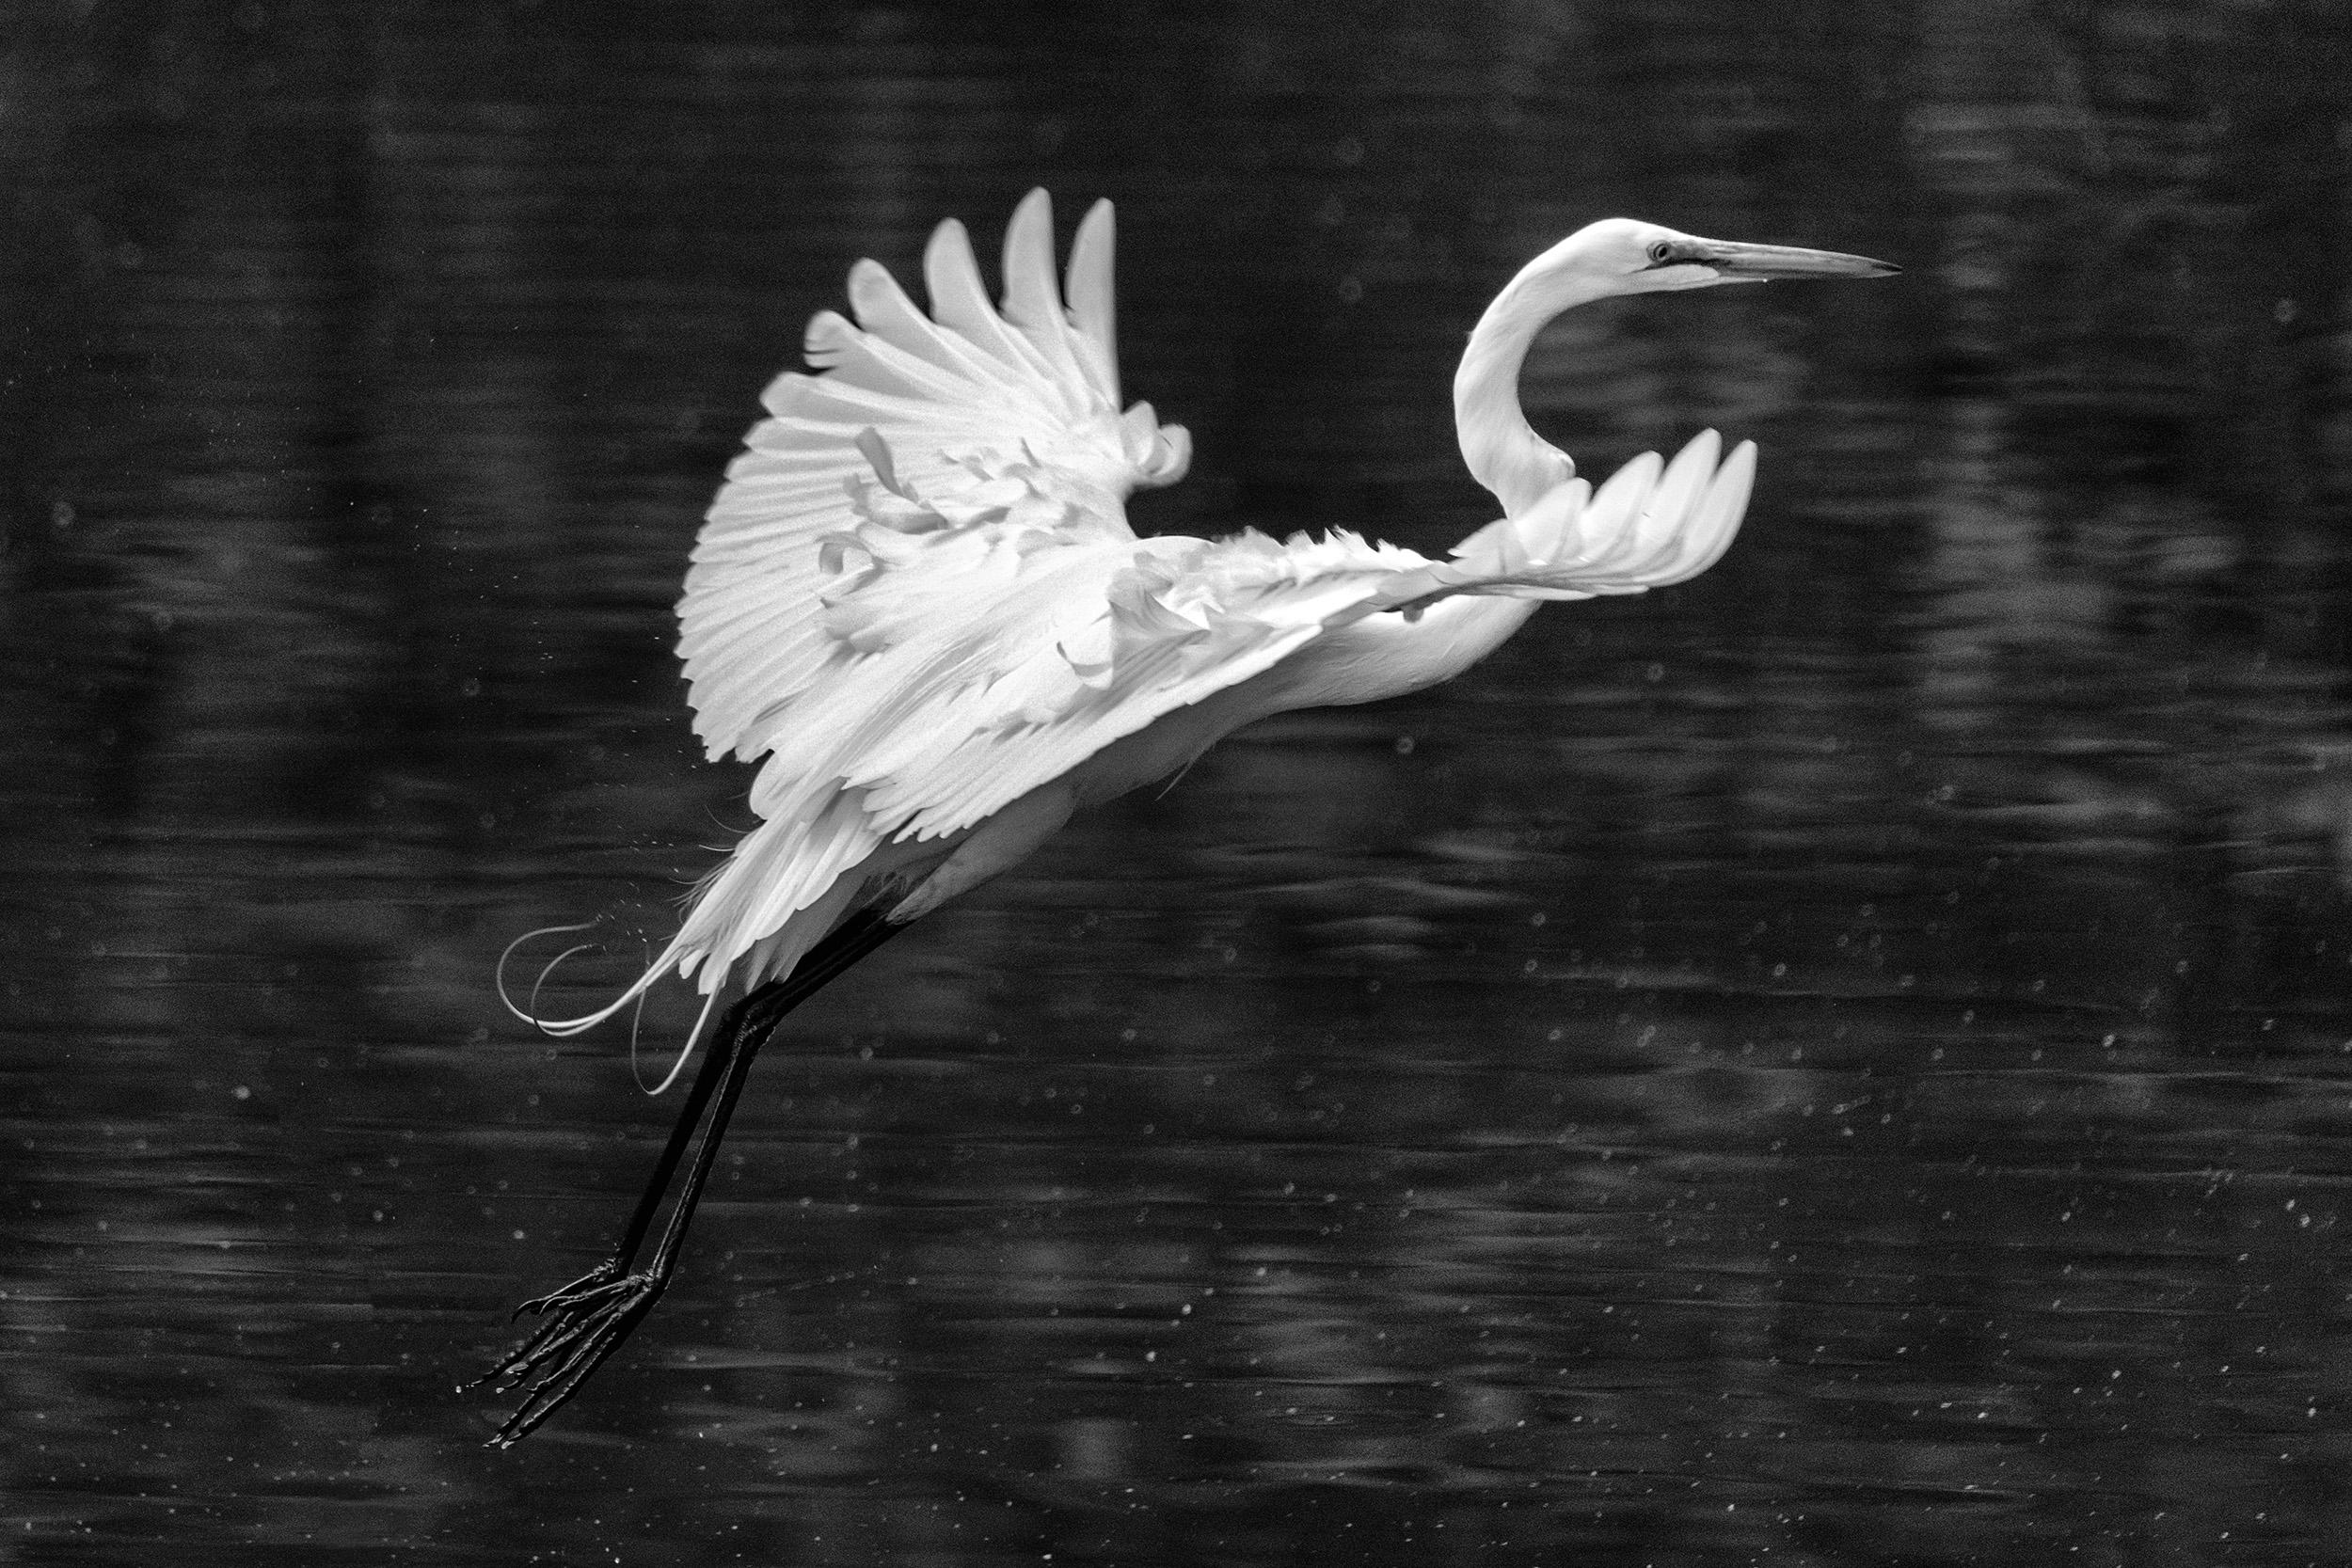 190518 Canal Birds XT2 127-1 cln bw.jpg